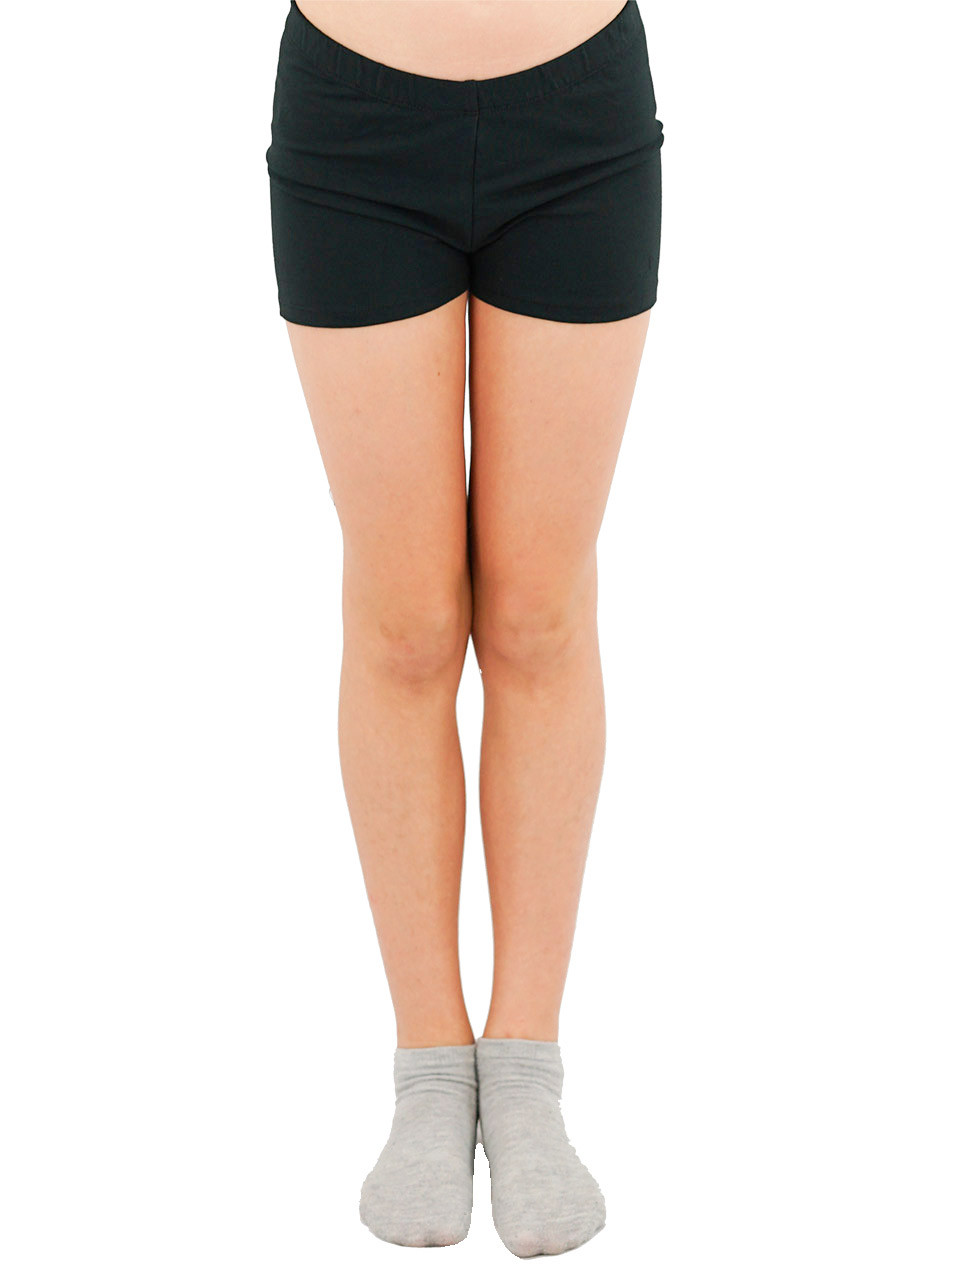 c7985c5fbd0 Vivian s Fashions Legging Shorts - Girls